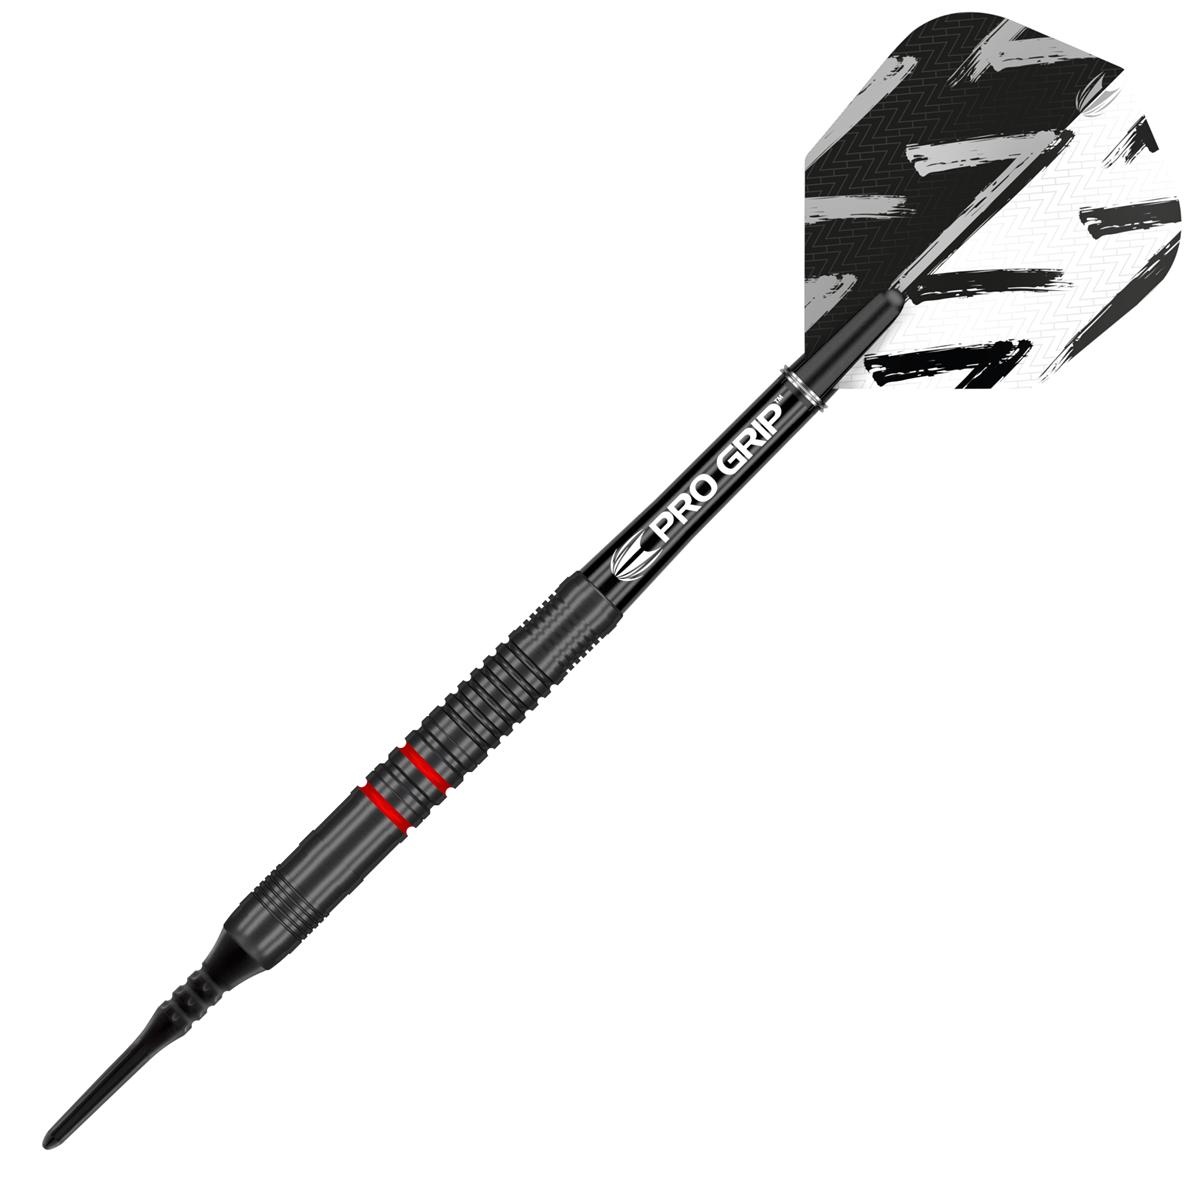 Target Darts Vapor Z Red 80% Tungsten 17 grams